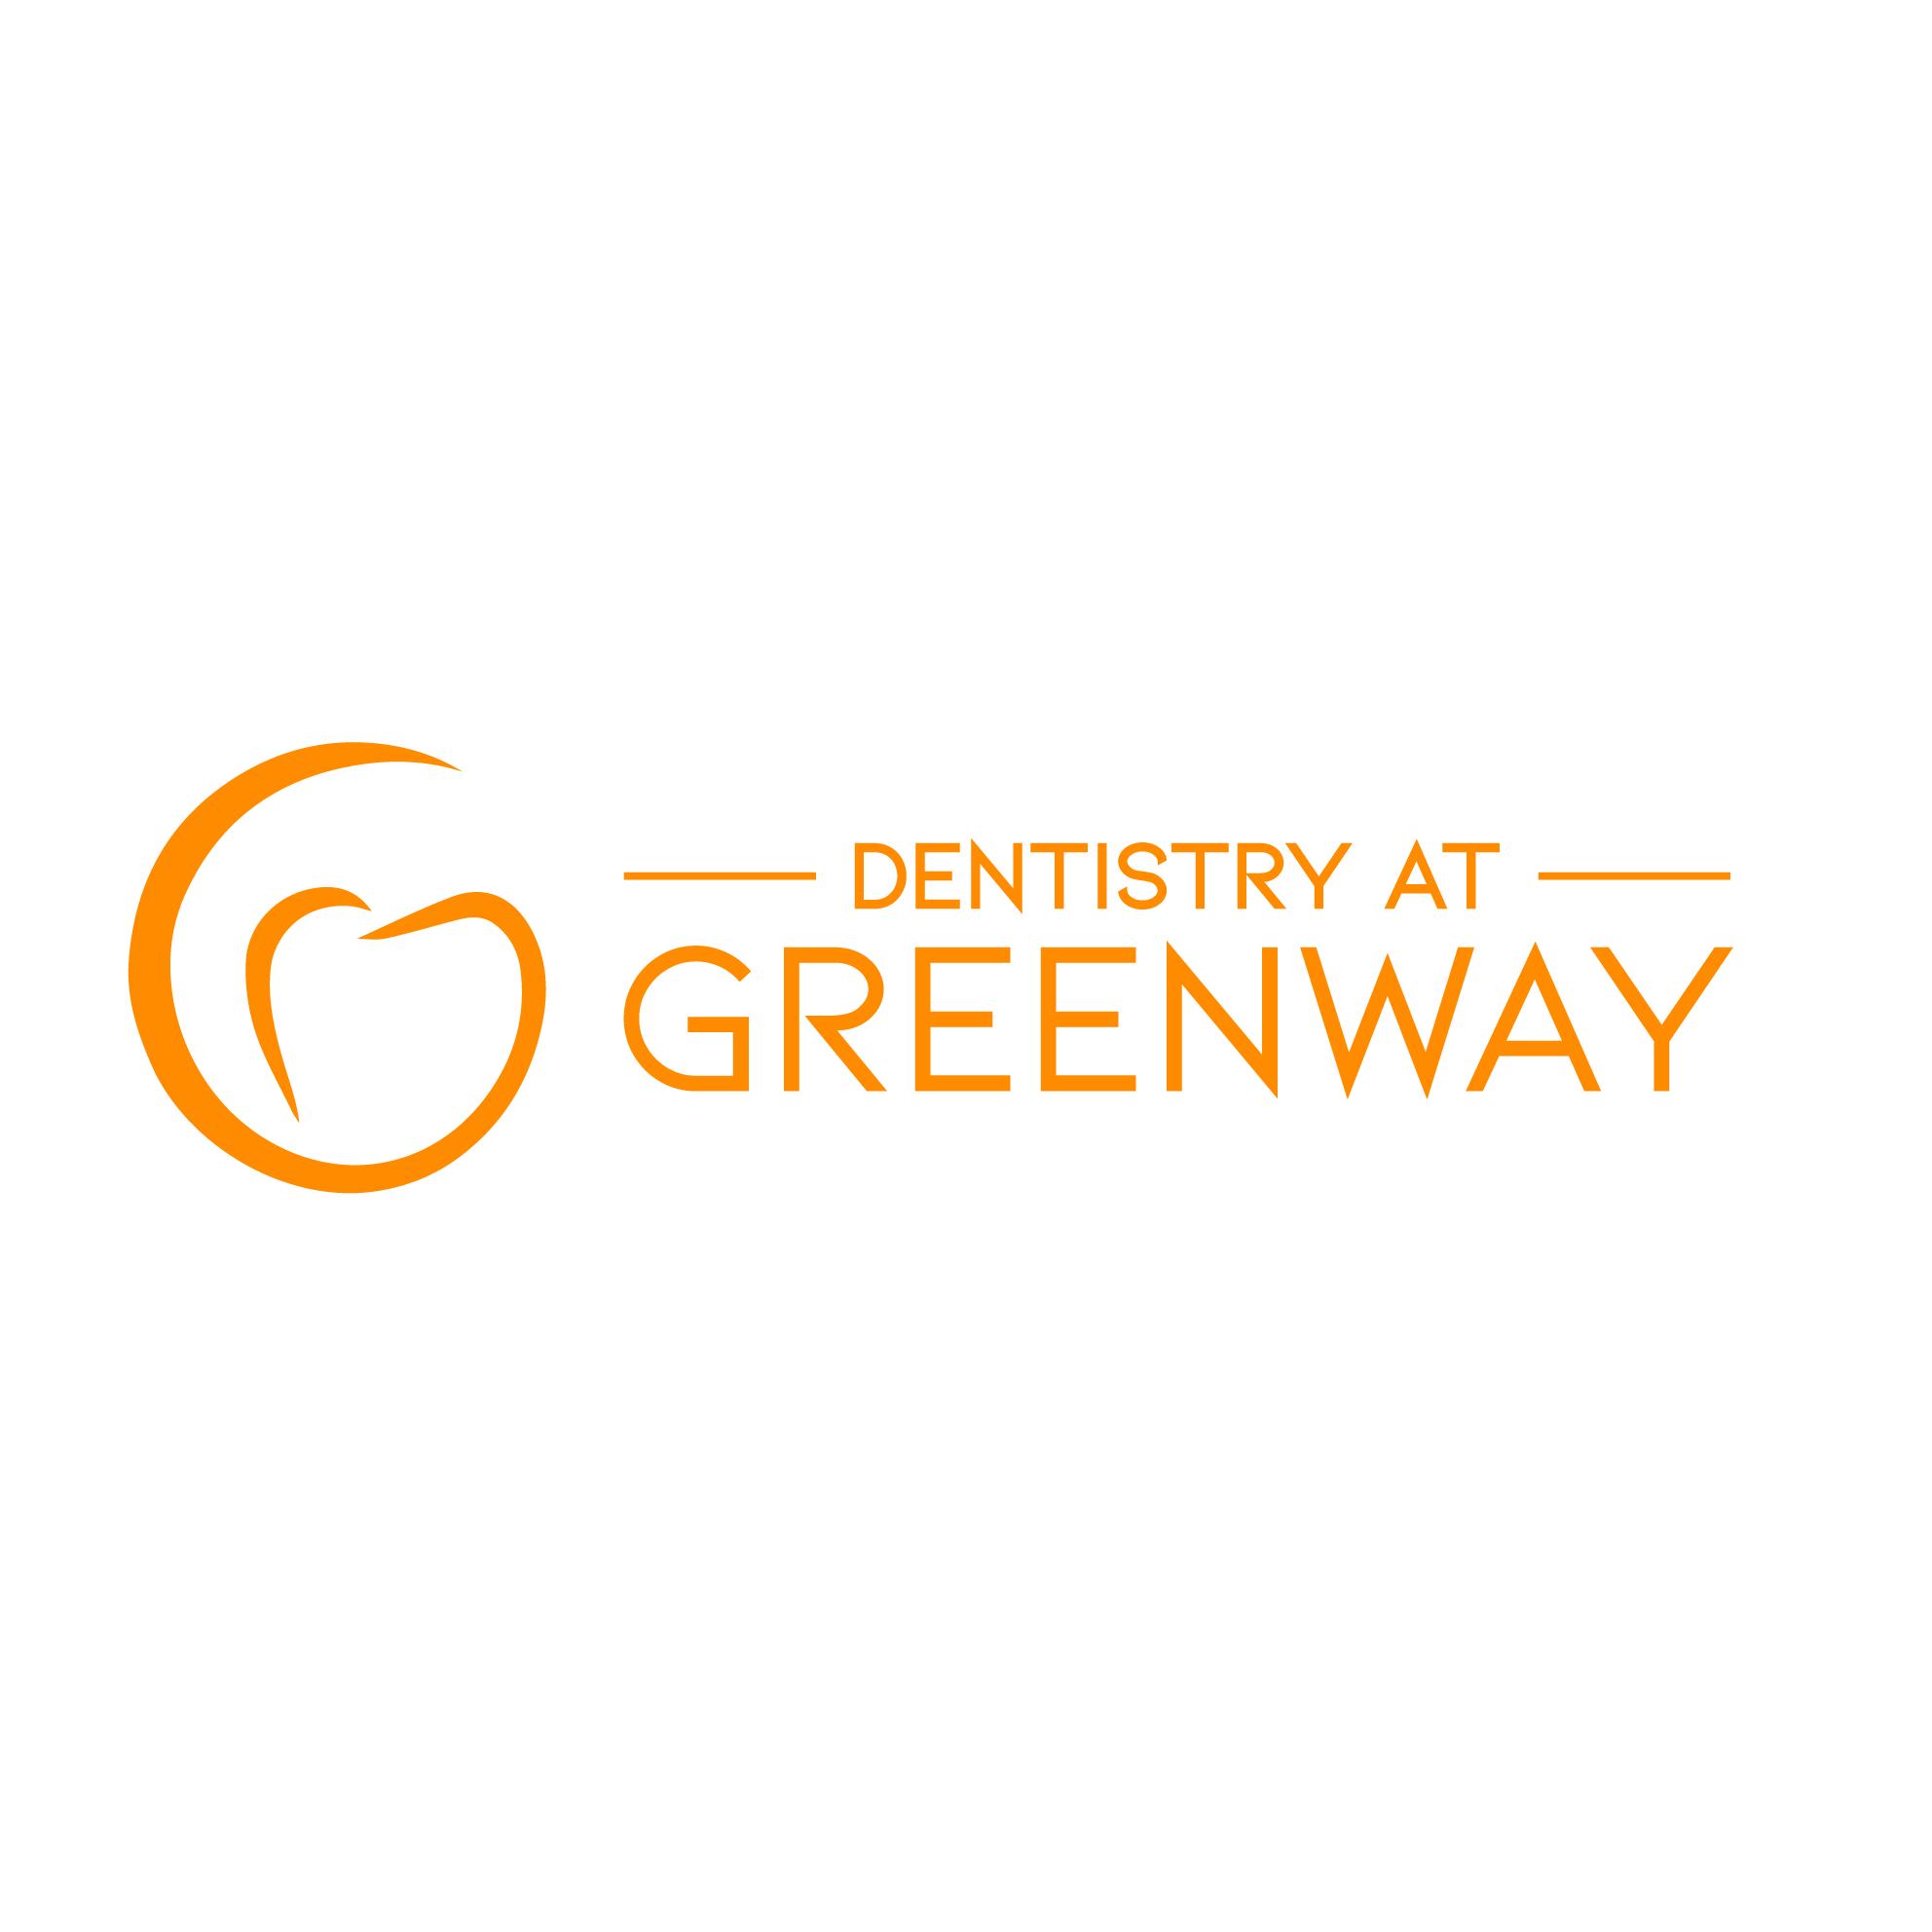 Dentistry at Greenway - Surprise, AZ - Dentists & Dental Services